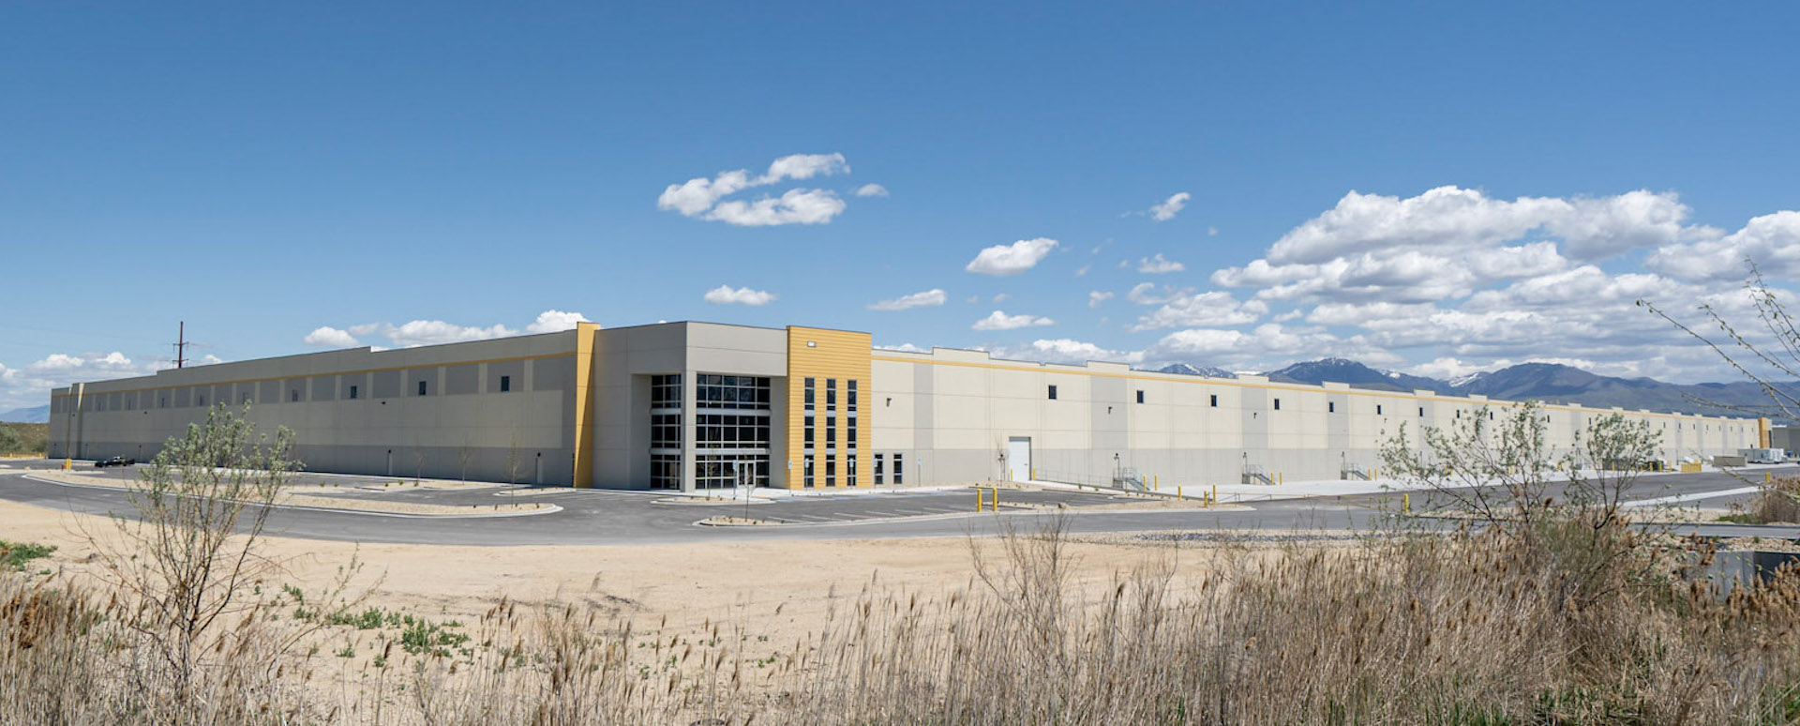 Summit Logistics Center - Salt Lake City, UT 6